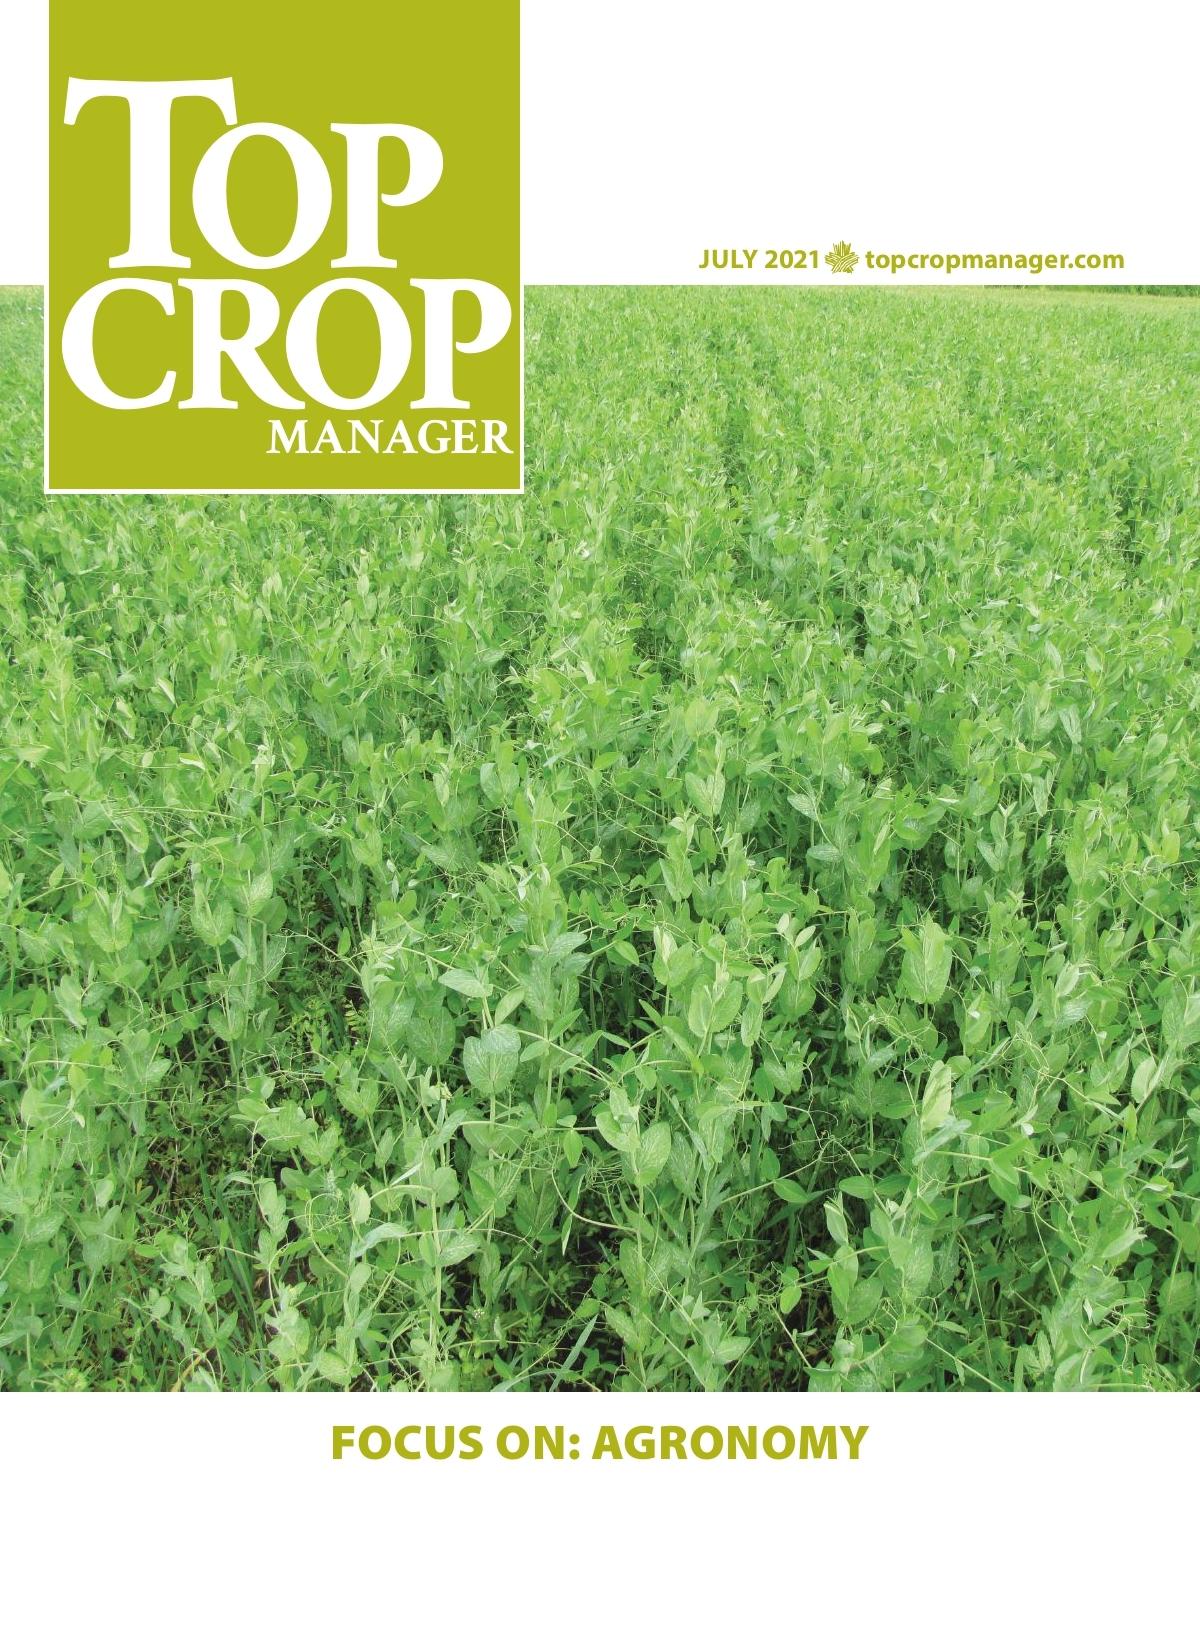 Focus on: Agronomy